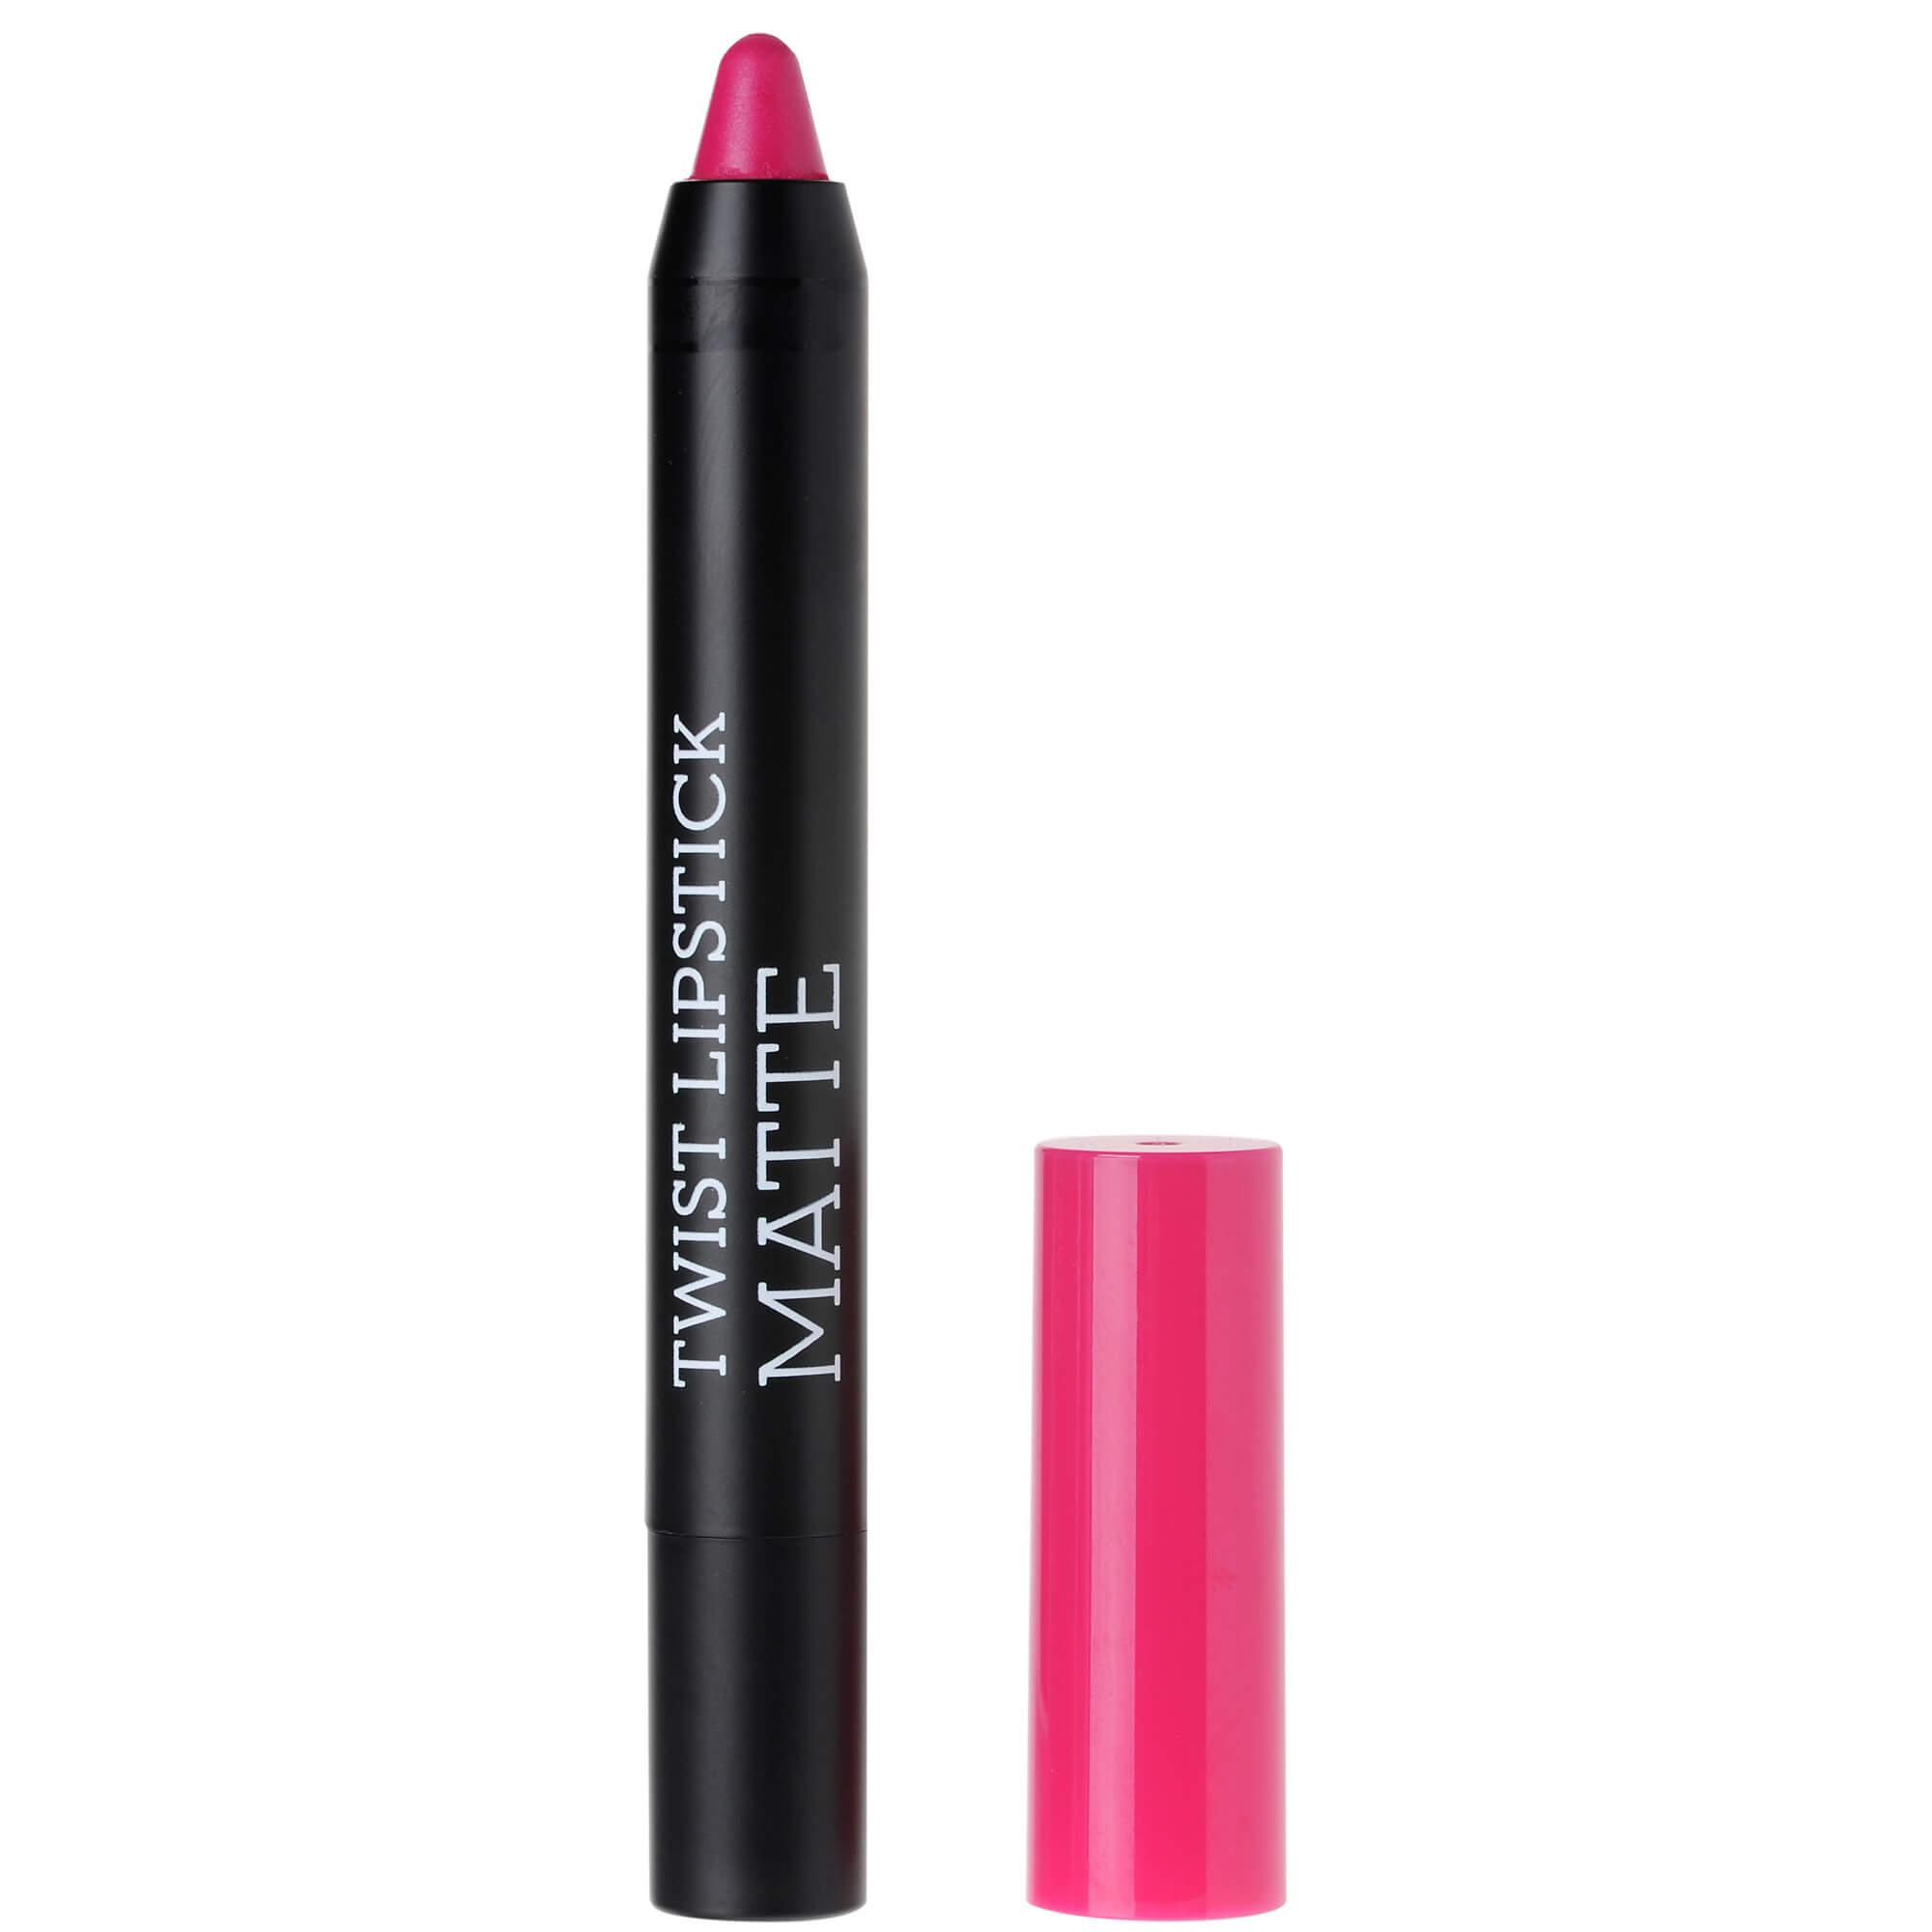 Korres Twist Lipstick Matte, Ultra Mat Αποτέλεσμα, Έντονο Χρώμα, Απόλυτη Άνεση στα Χείλη 1.5gr – Dazzling Fuchsia